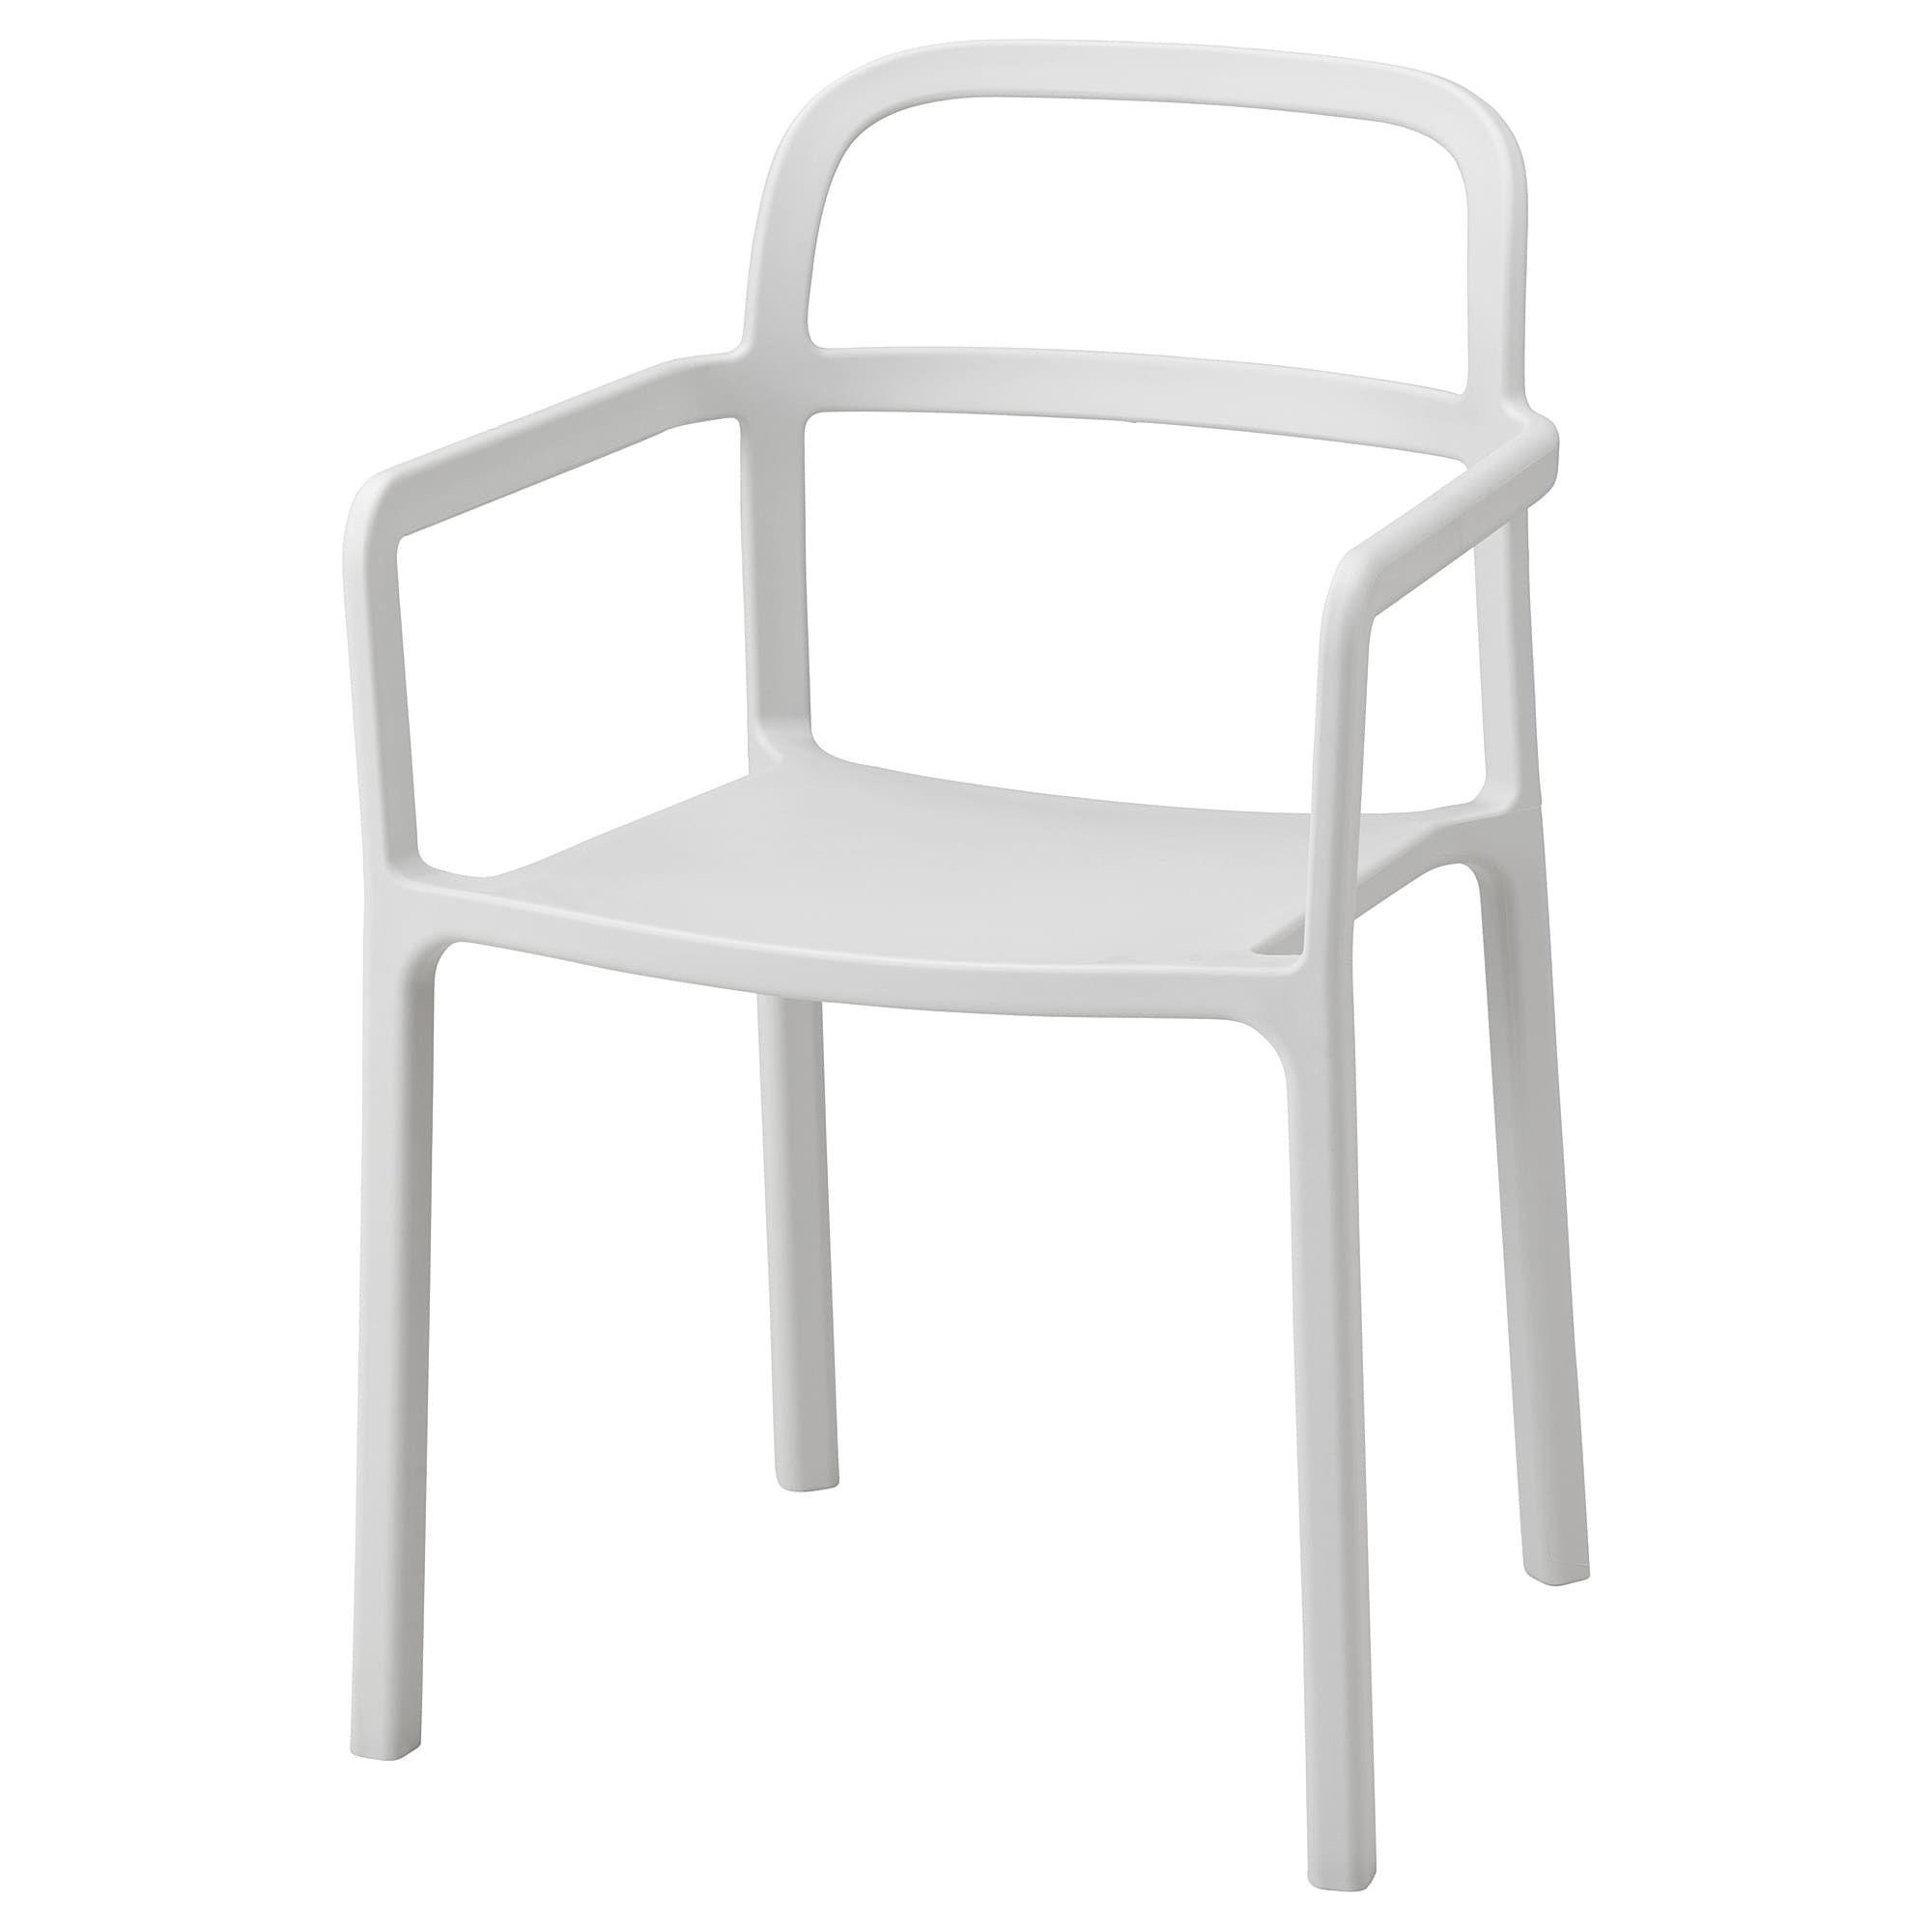 Ypperlig Armchair In Outdoor Light